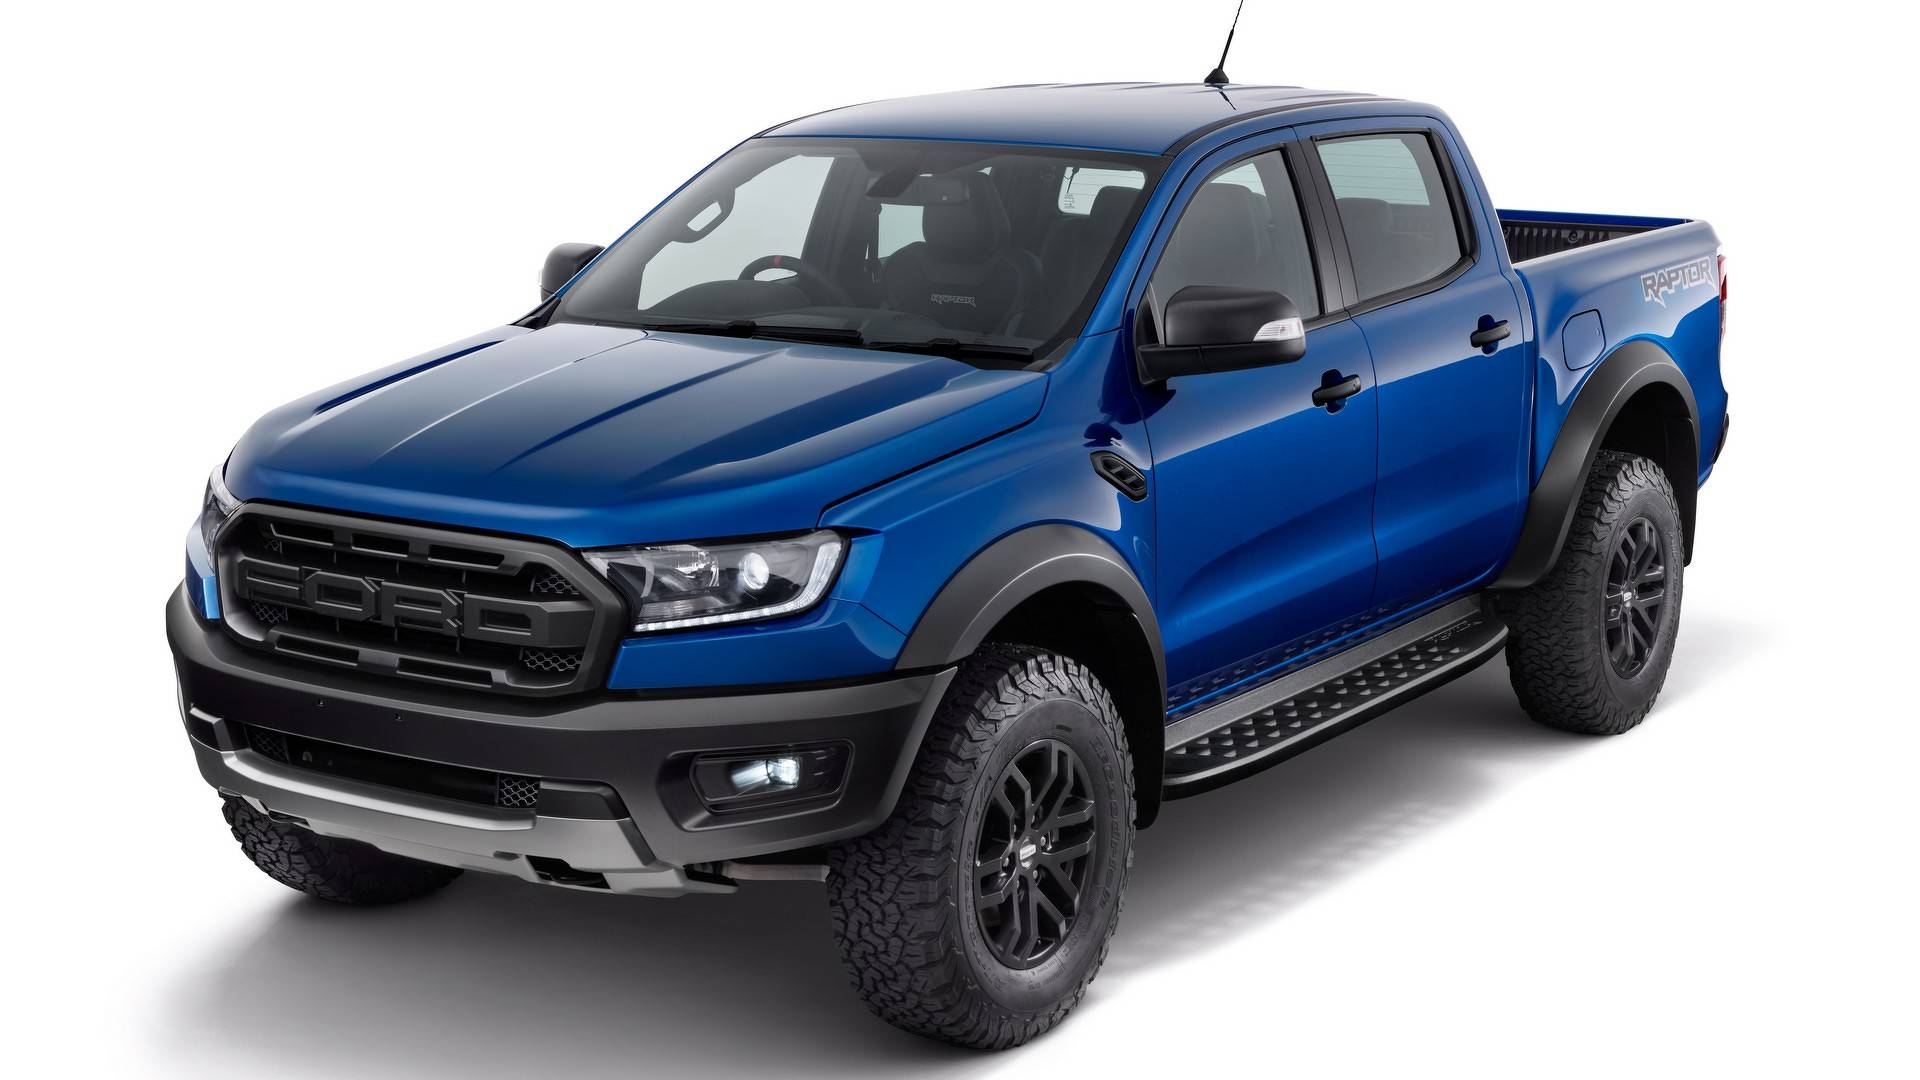 2018 Ford Ranger Raptor Specs | Motavera.com